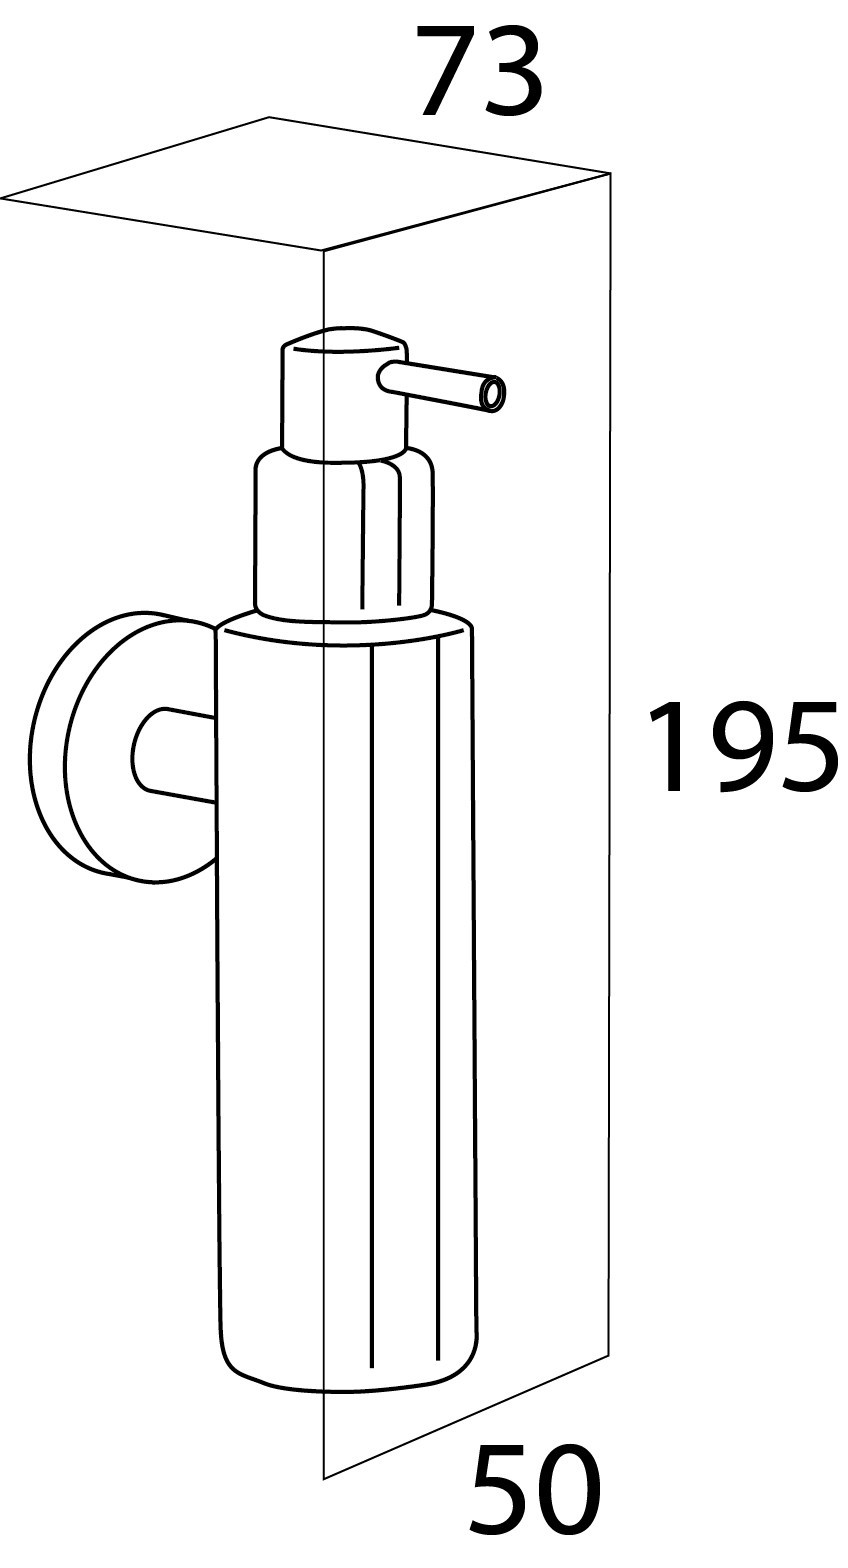 design xs edelstahl wand seifenspender boston oberfl che edelstahl poliert oder matt geb rstet. Black Bedroom Furniture Sets. Home Design Ideas